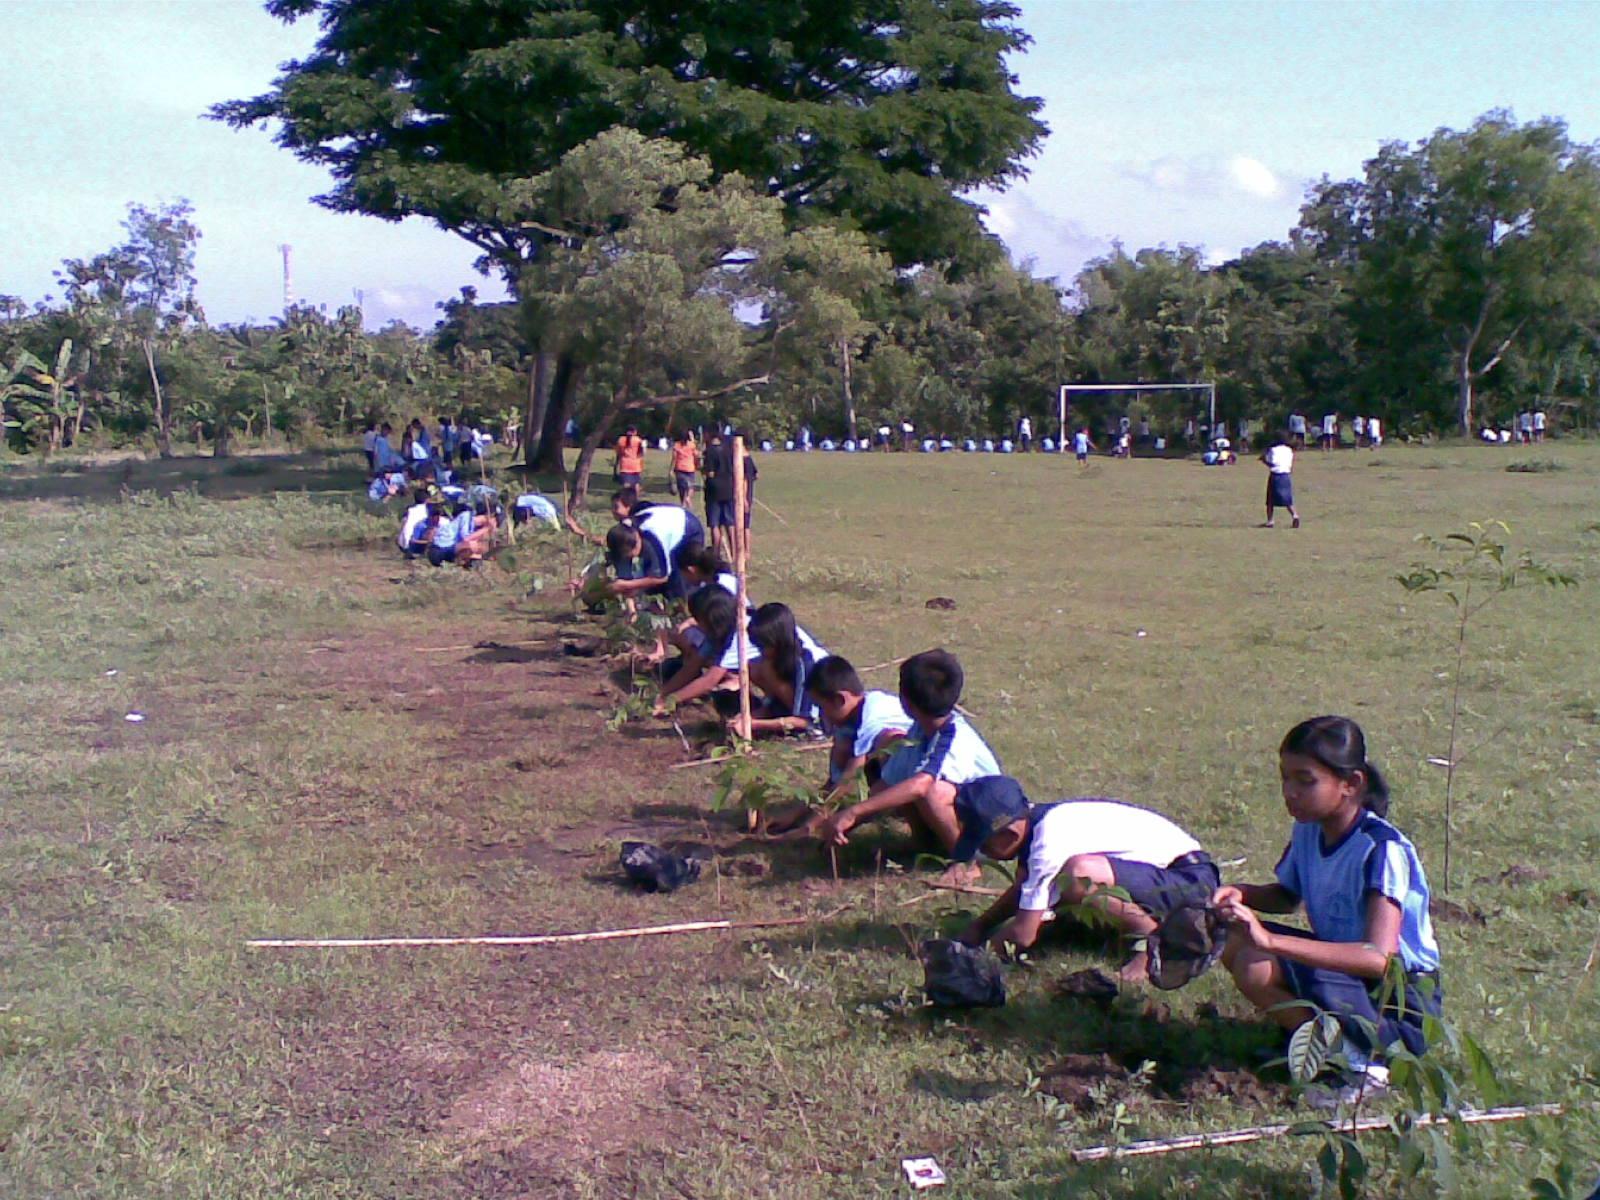 Program penanaman pohon dilingkungan sekolahan selain menjadikan